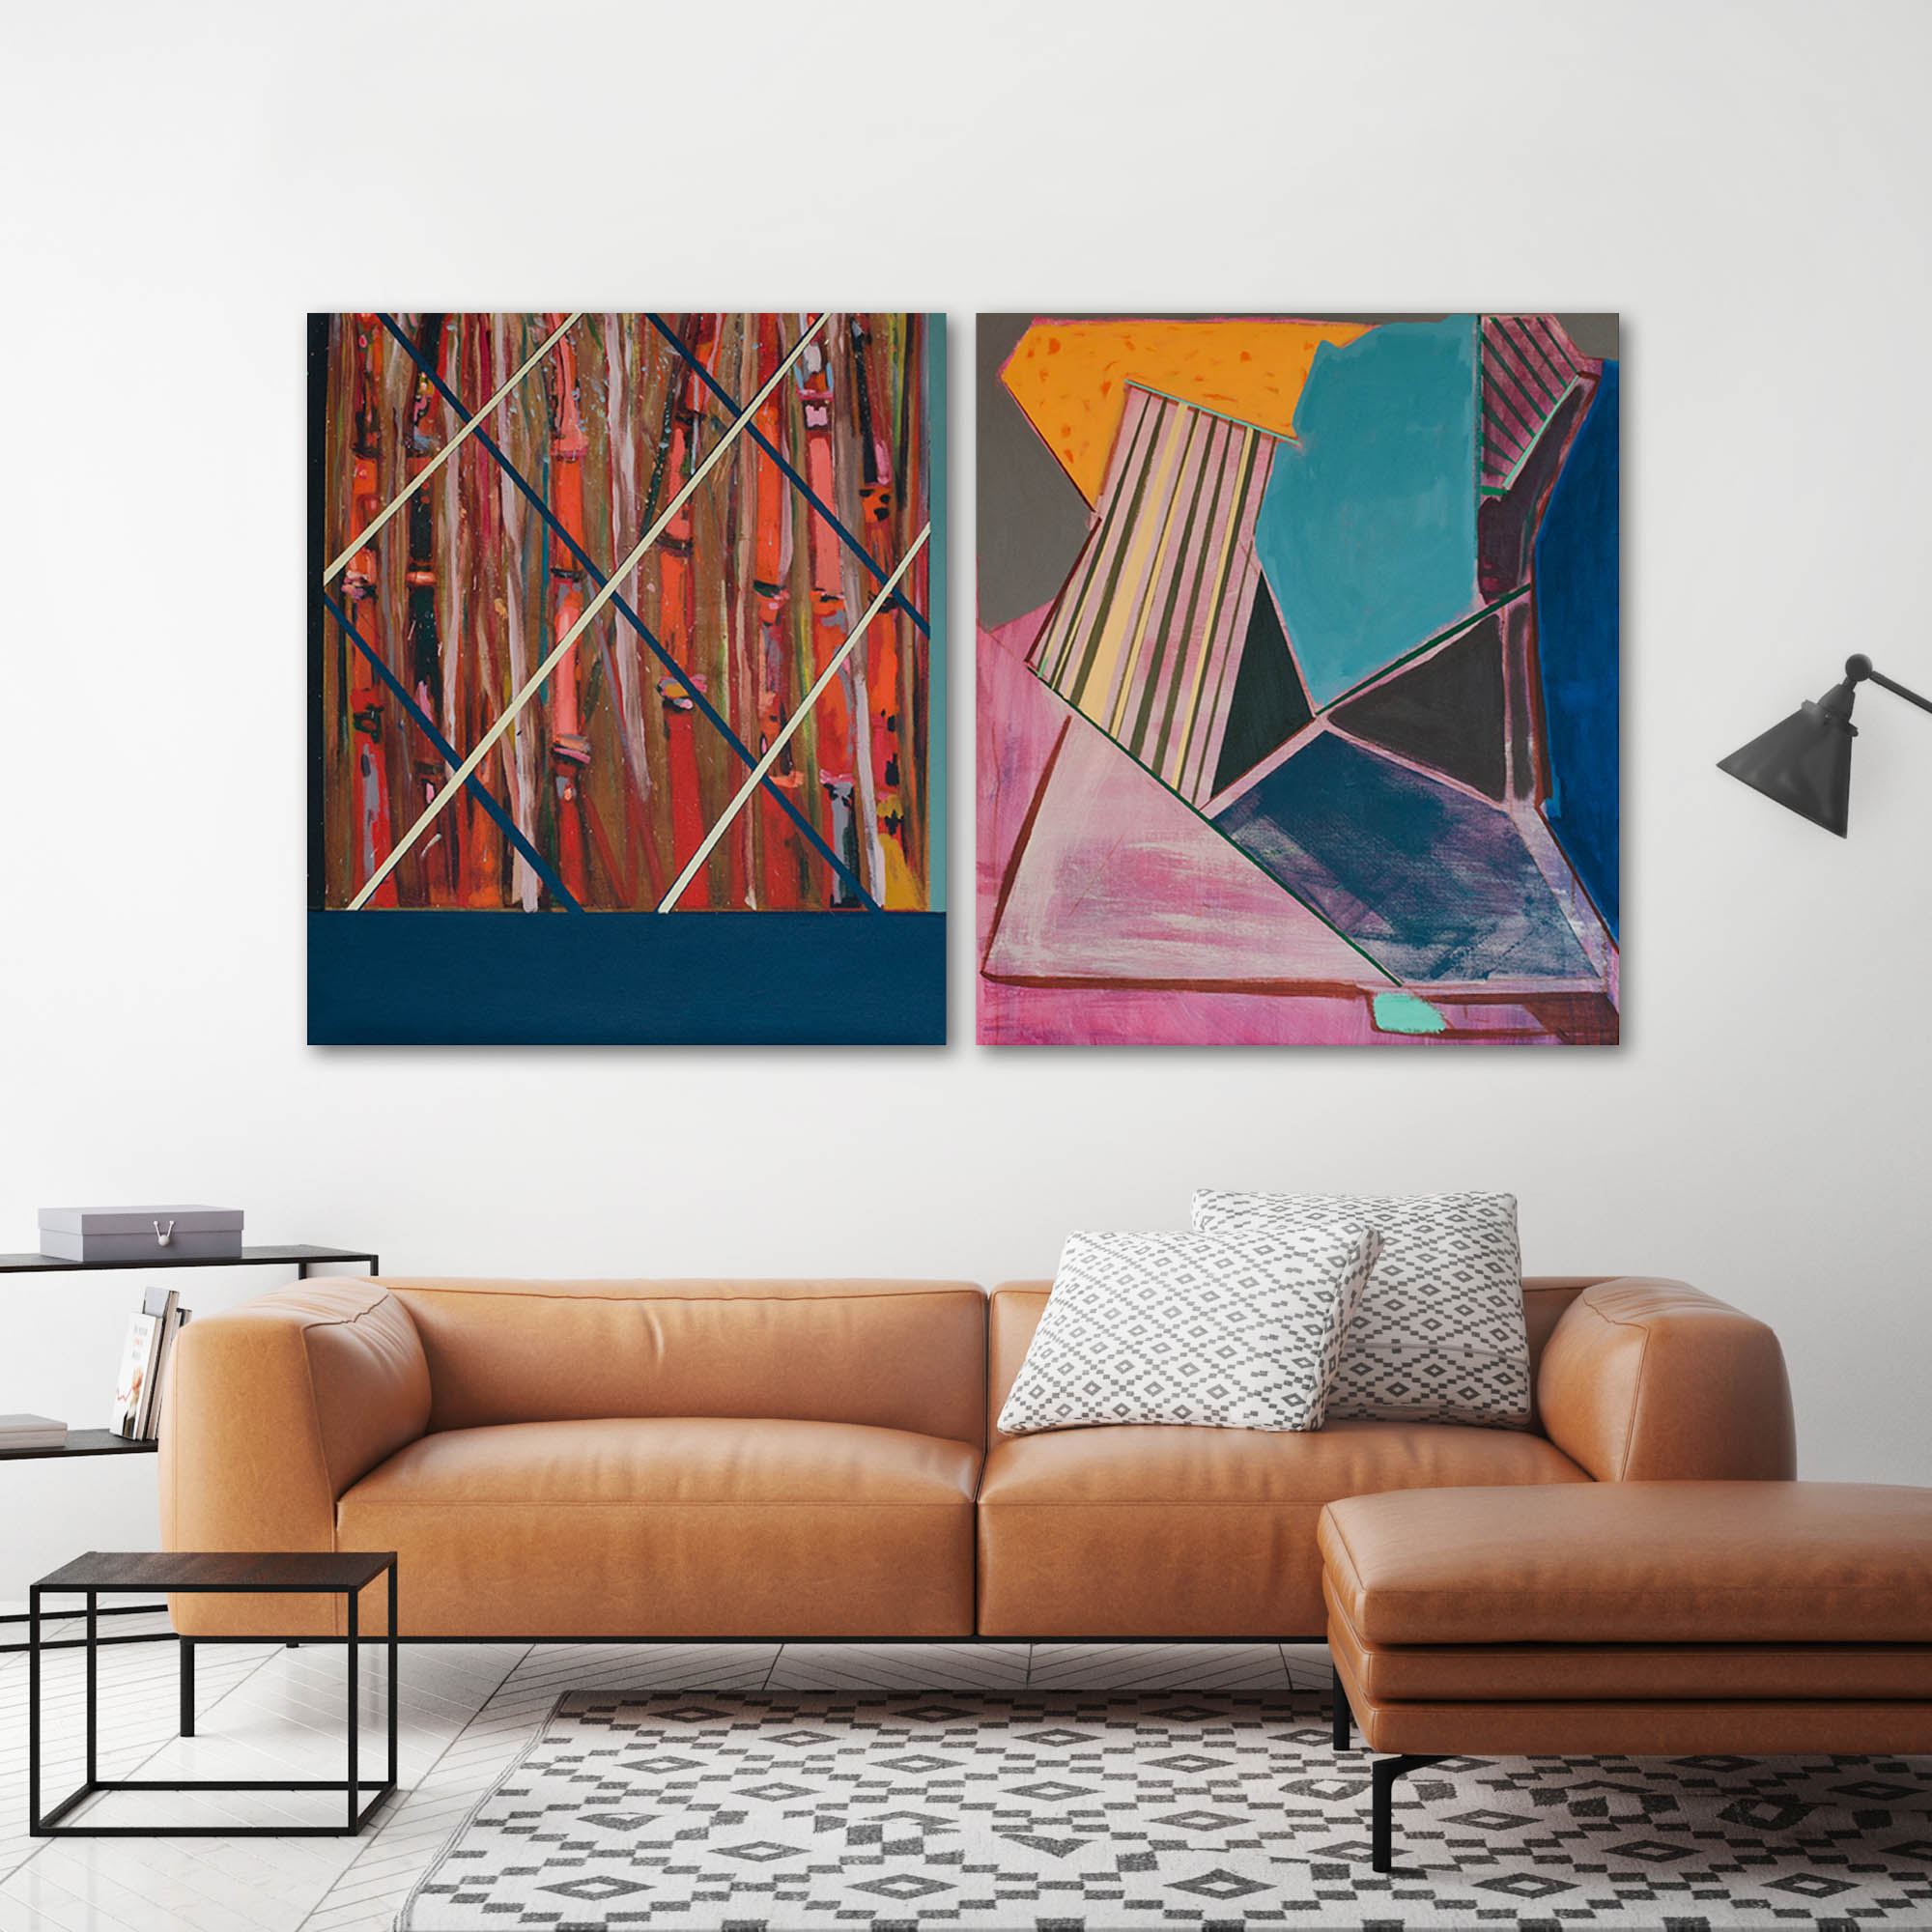 Pintura, Bambúes dinámicos de Agustín Guty González en living